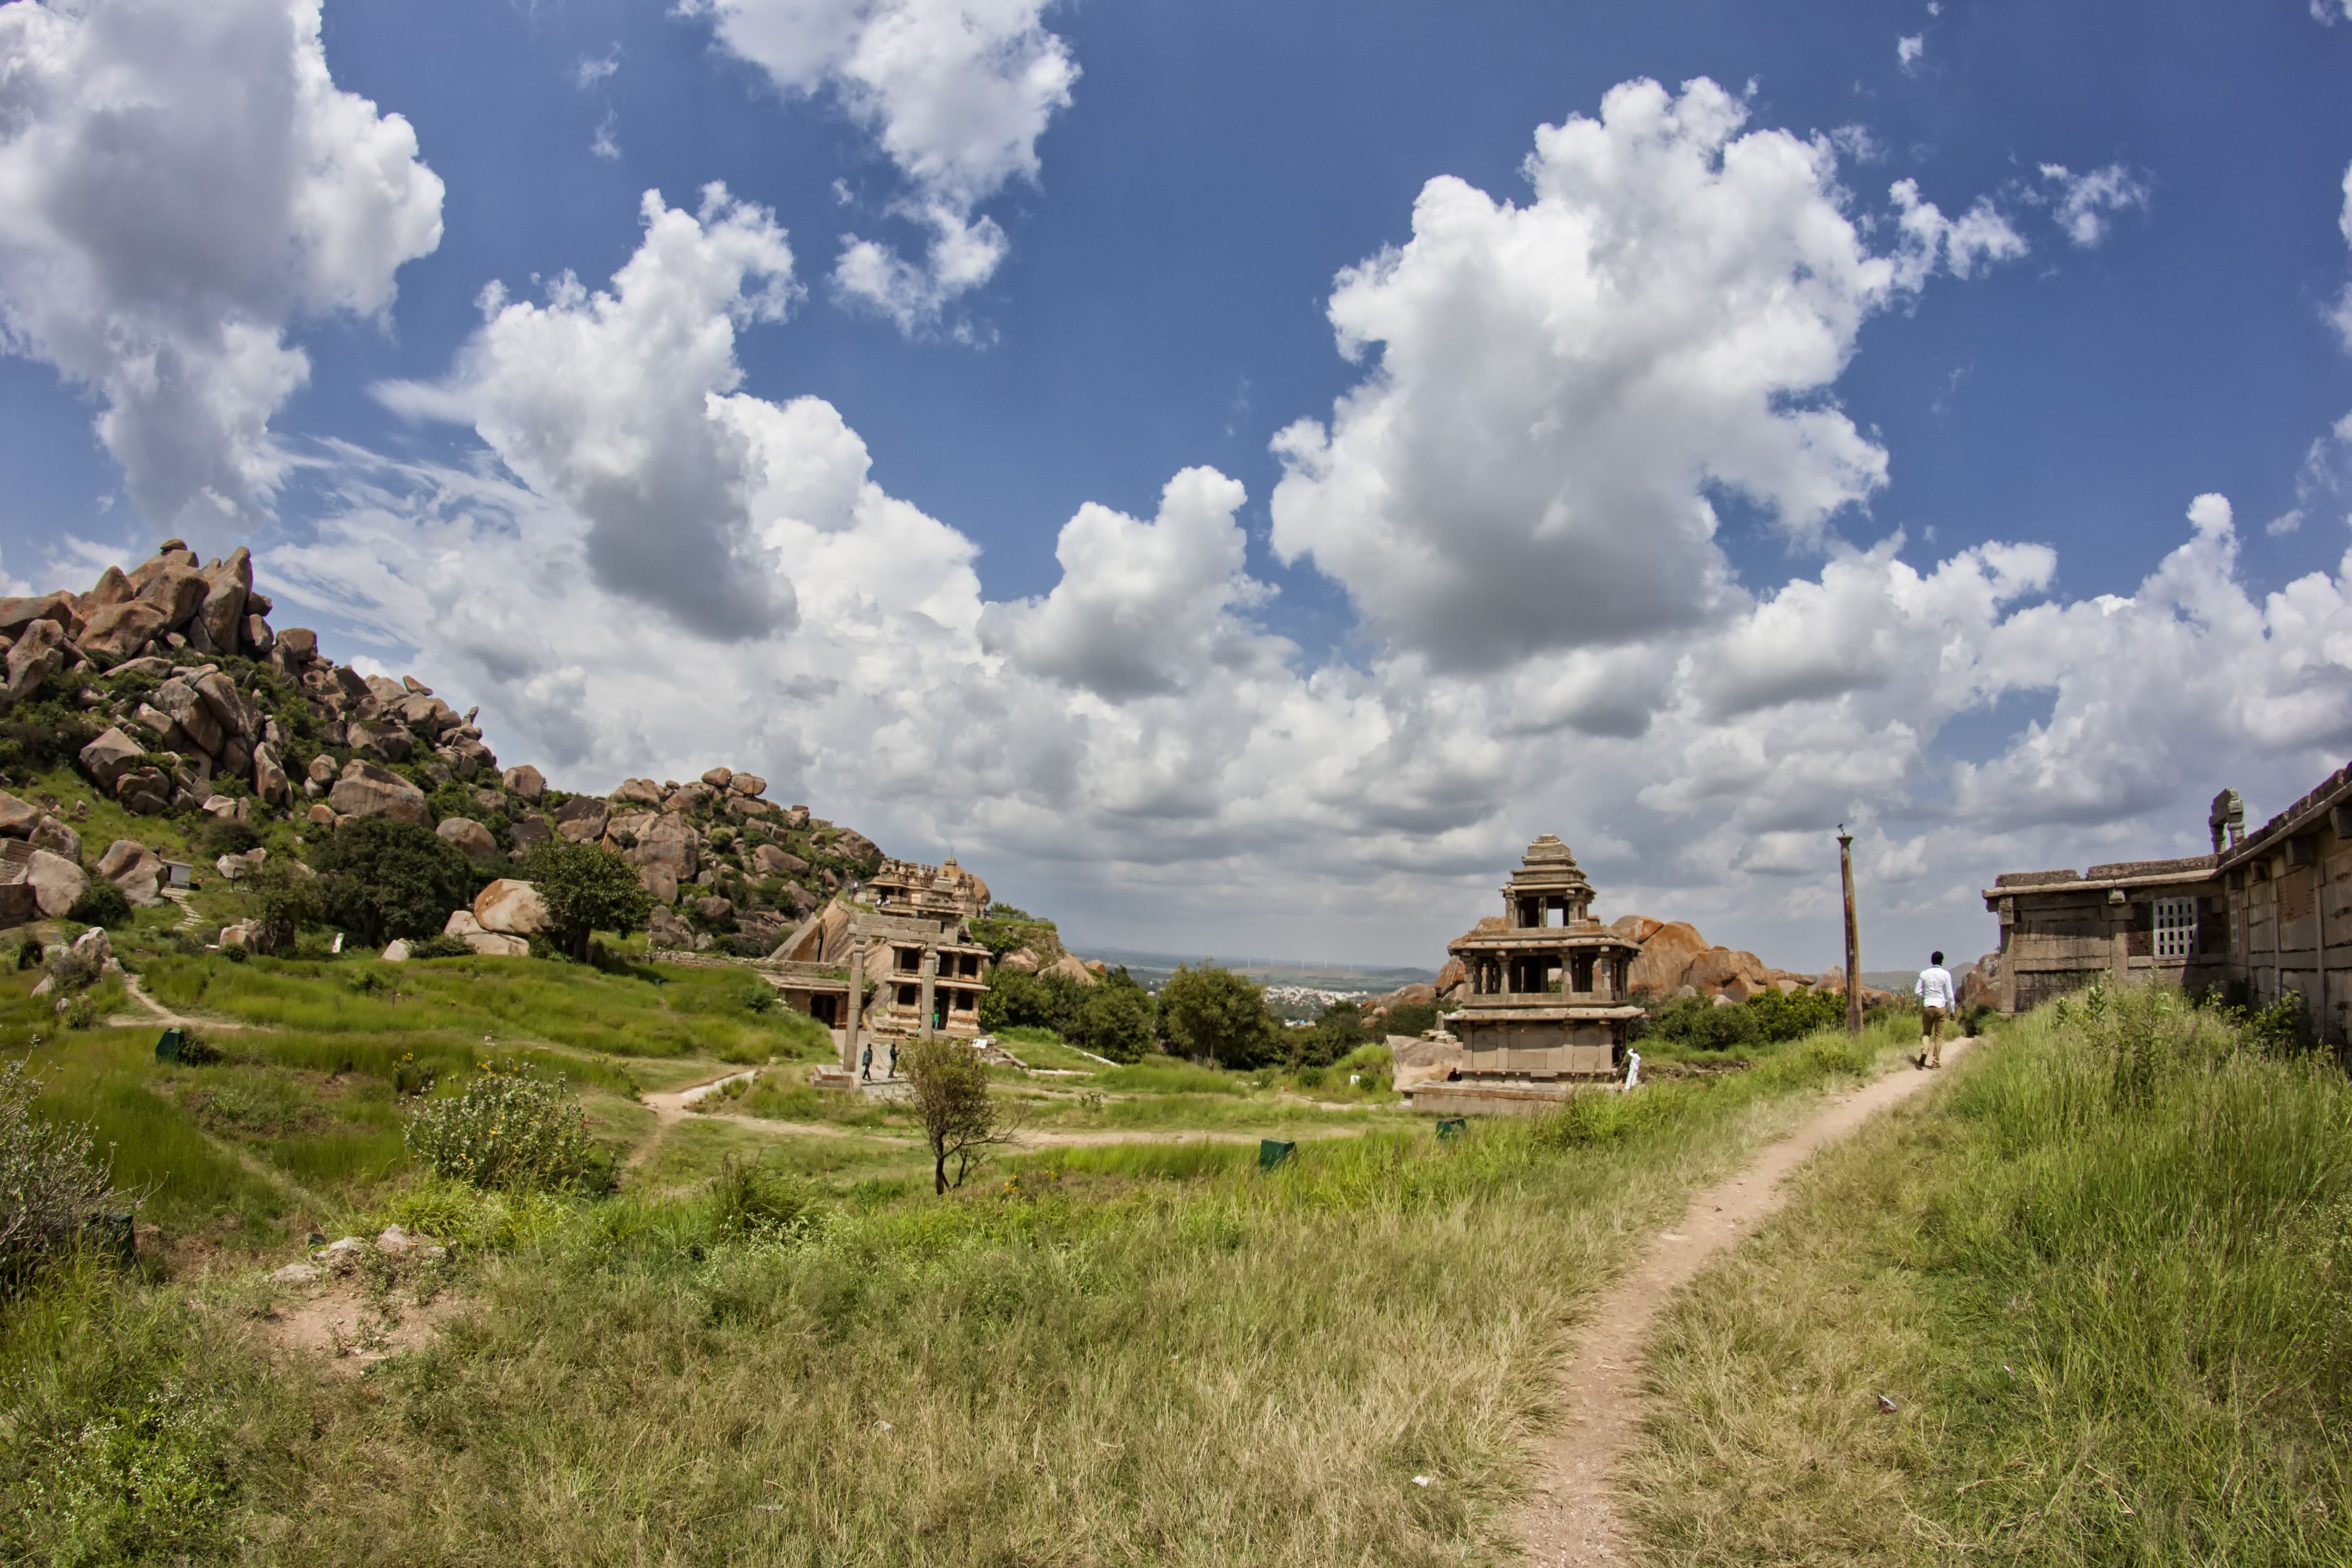 The remains inside ChitraDurga Fort